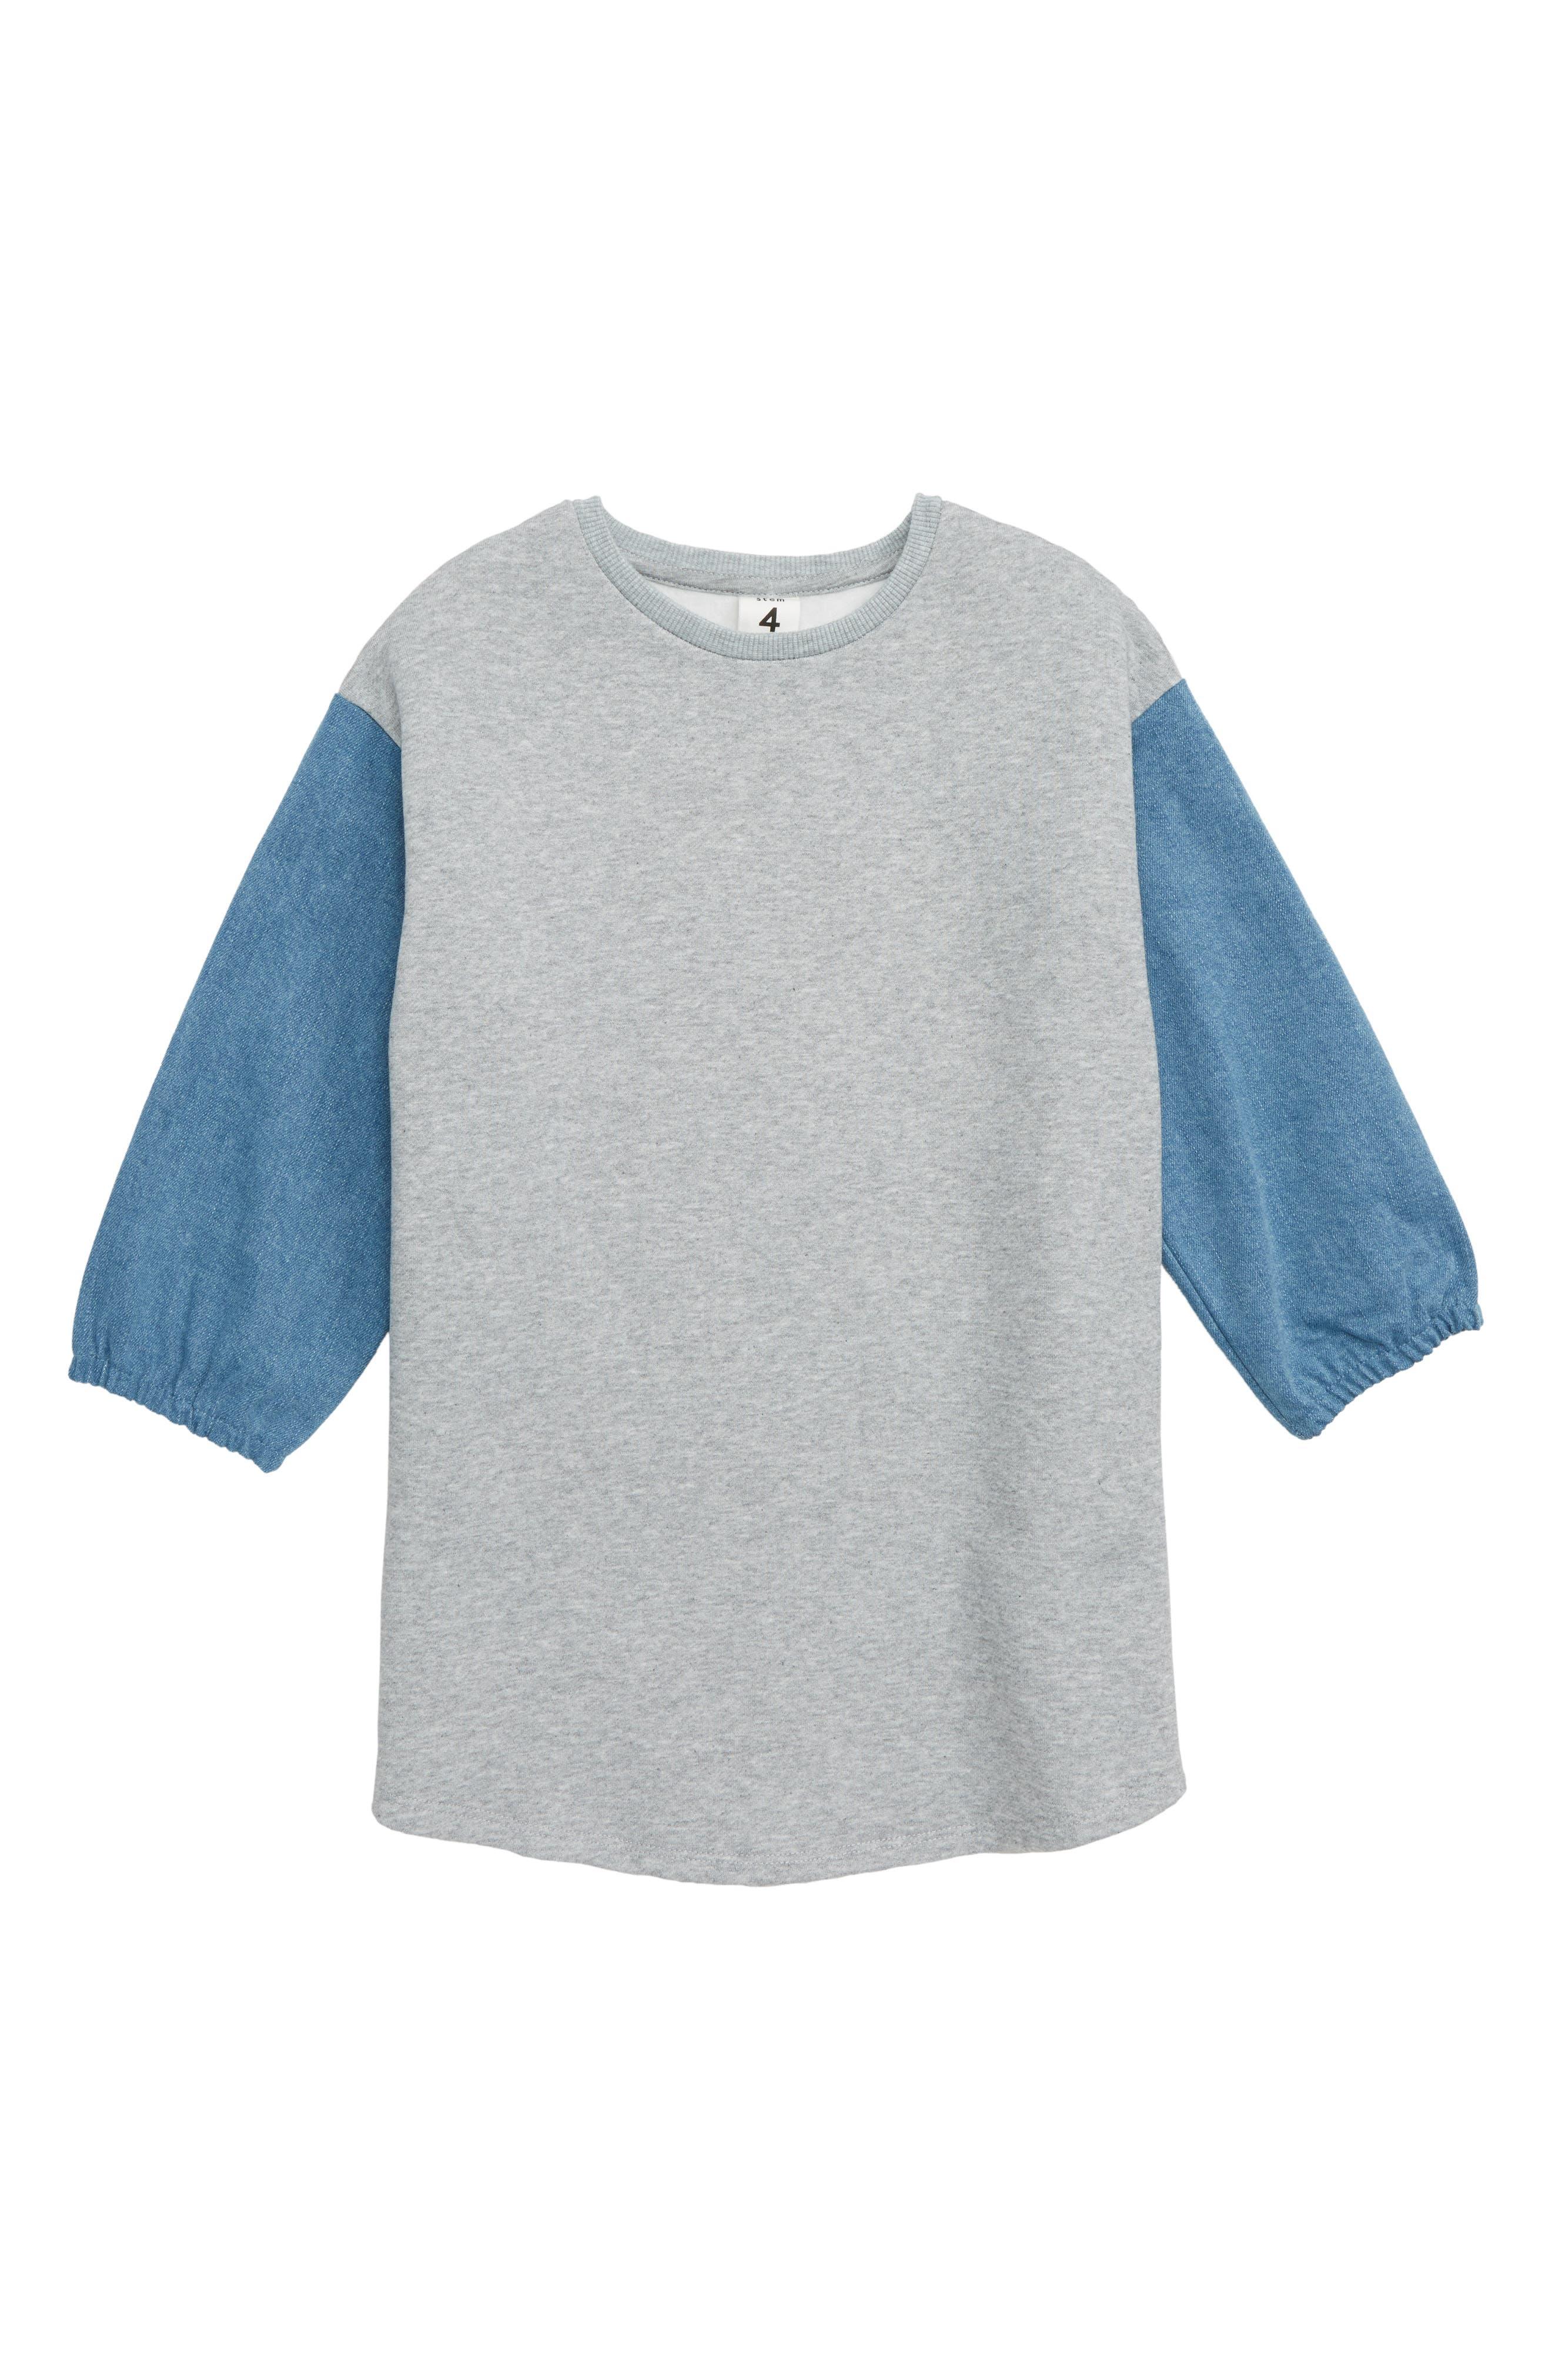 Denim Puff Sleeve Sweatshirt Dress,                             Main thumbnail 1, color,                             030